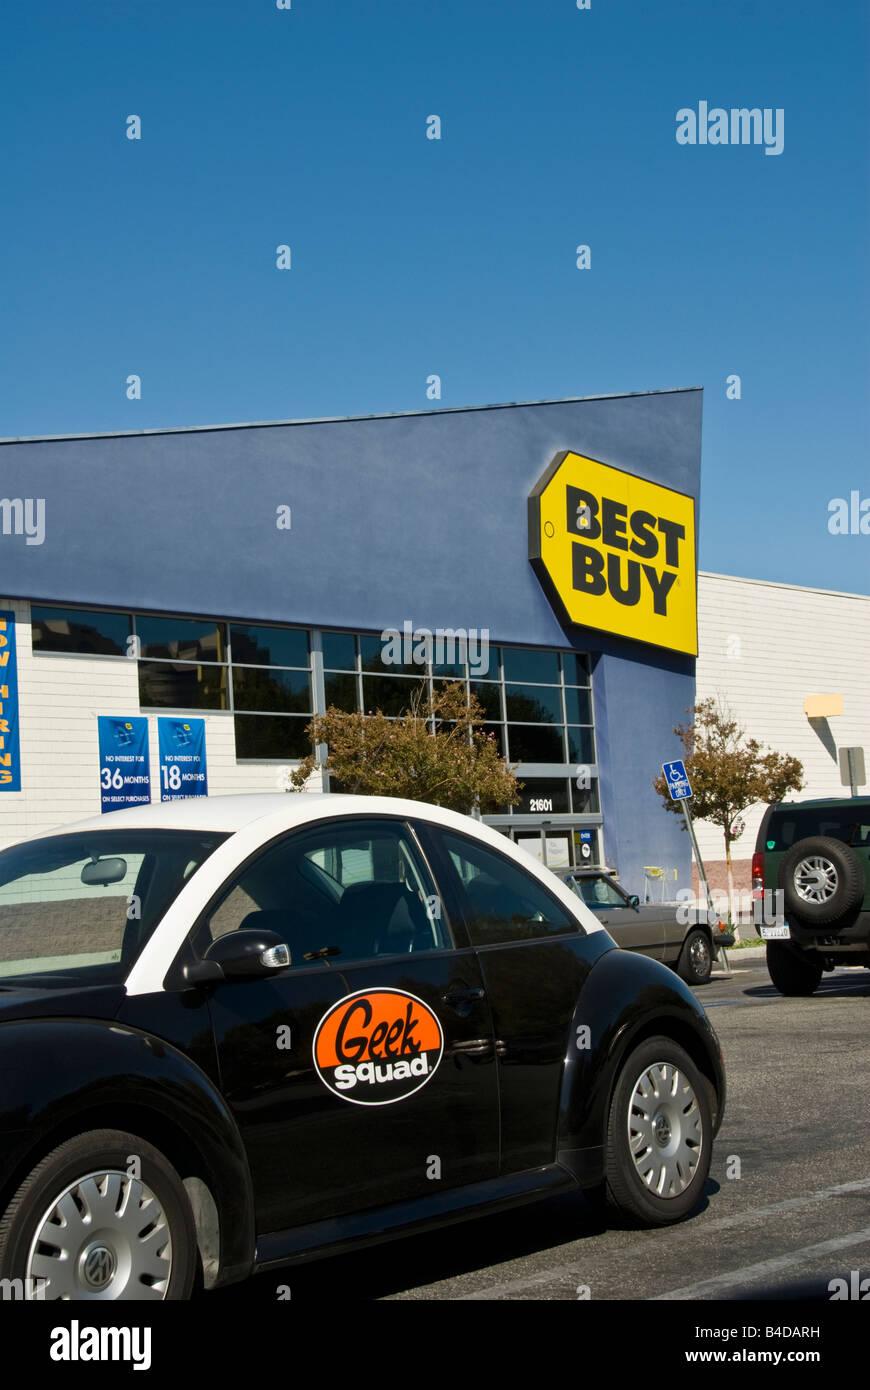 Geek Squad Best Buy Brands Sells Insignia Dynex Init Geek Squad